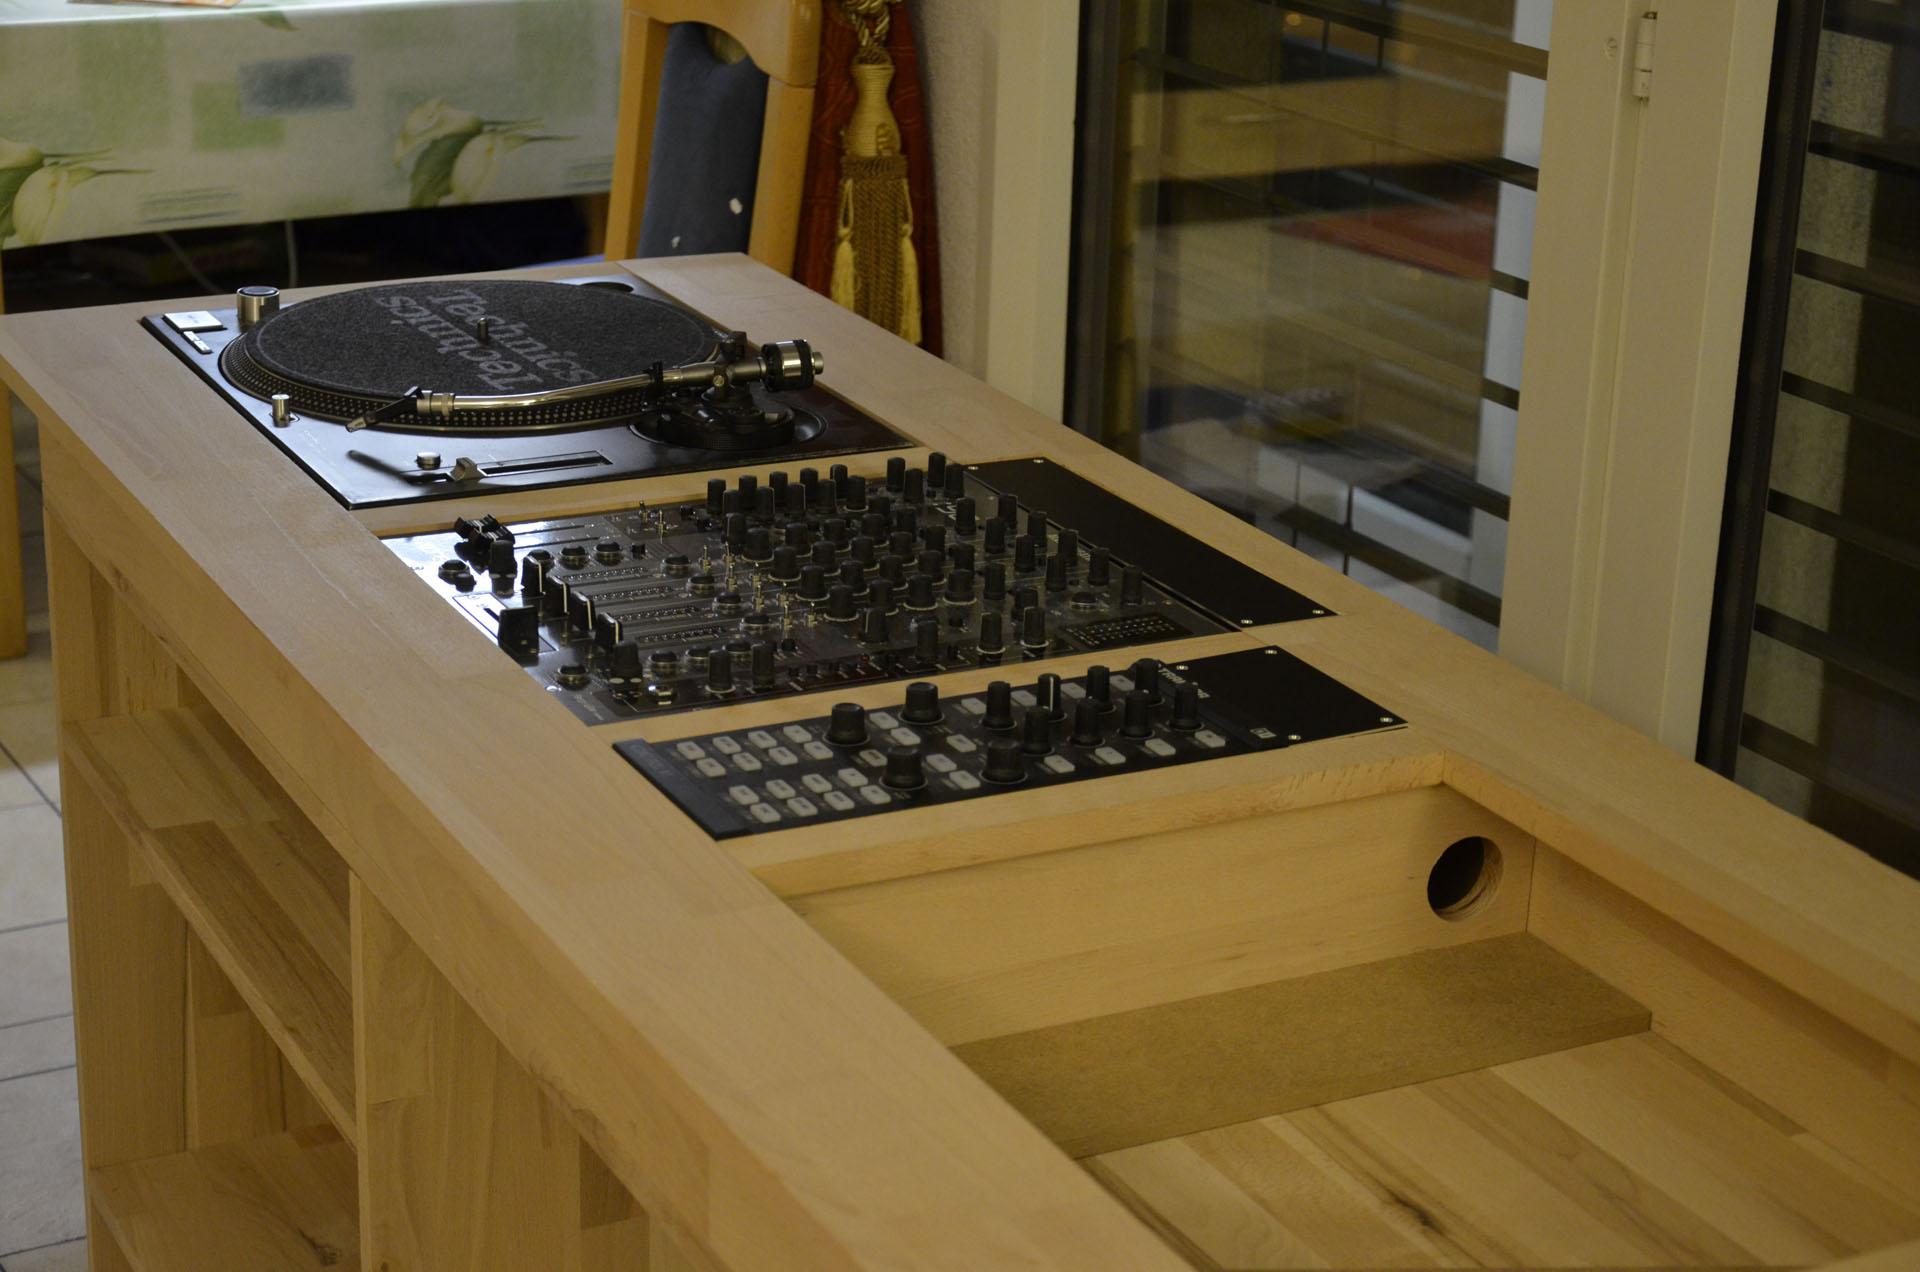 bricolage il est tr s commode ton meuble forum djing 7 10 audiofanzine. Black Bedroom Furniture Sets. Home Design Ideas